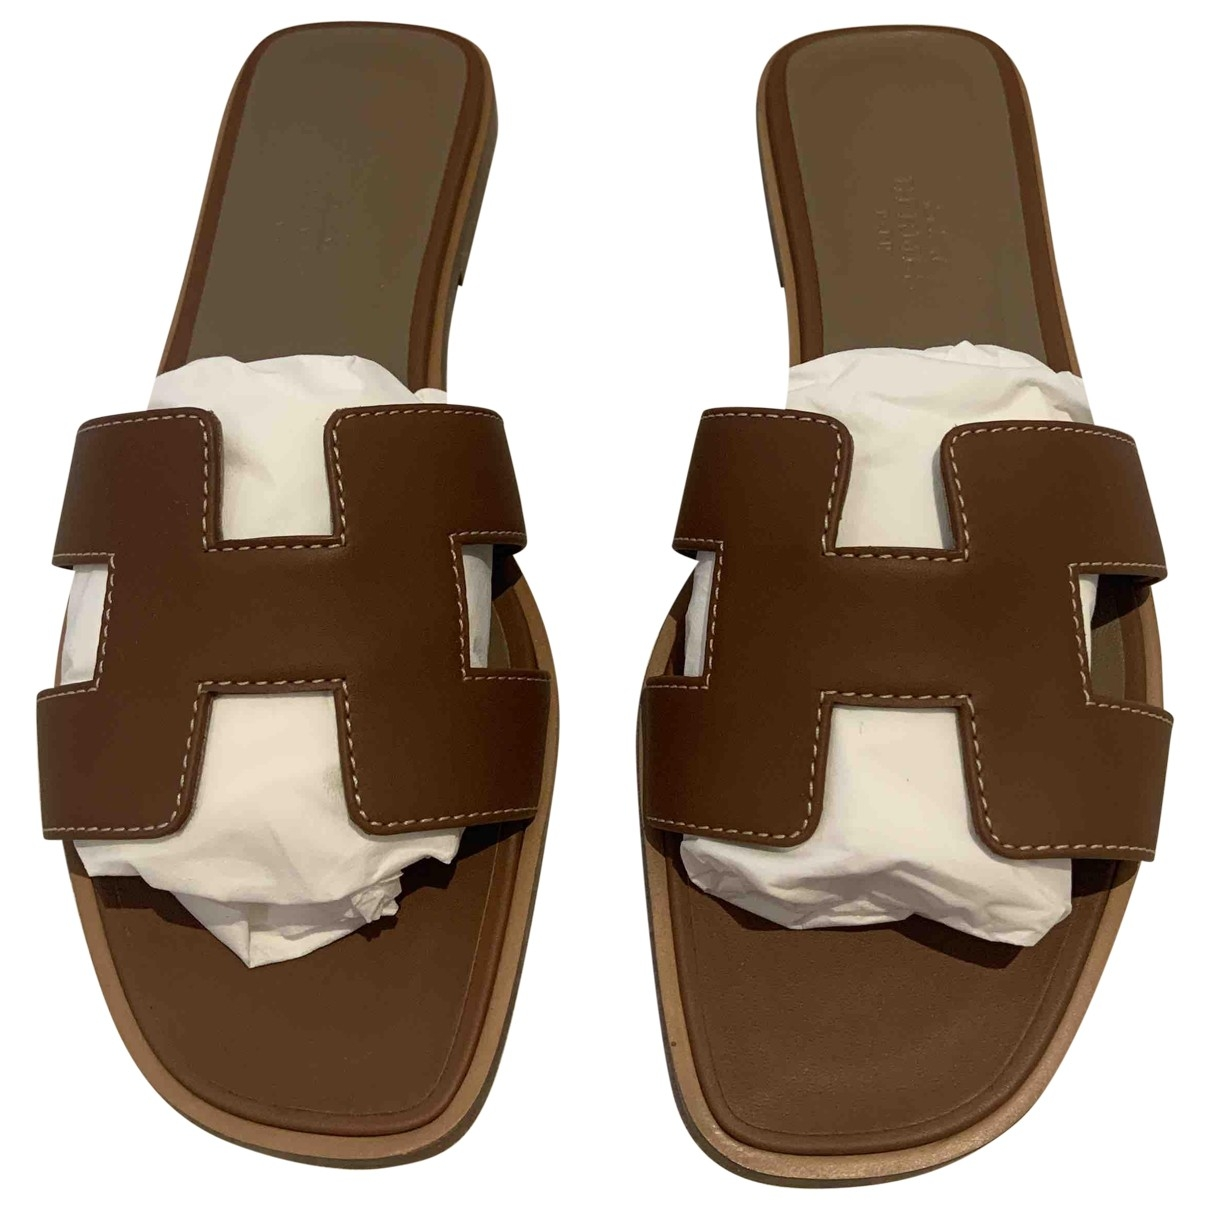 Hermès Oran Brown Leather Sandals for Women 37 EU